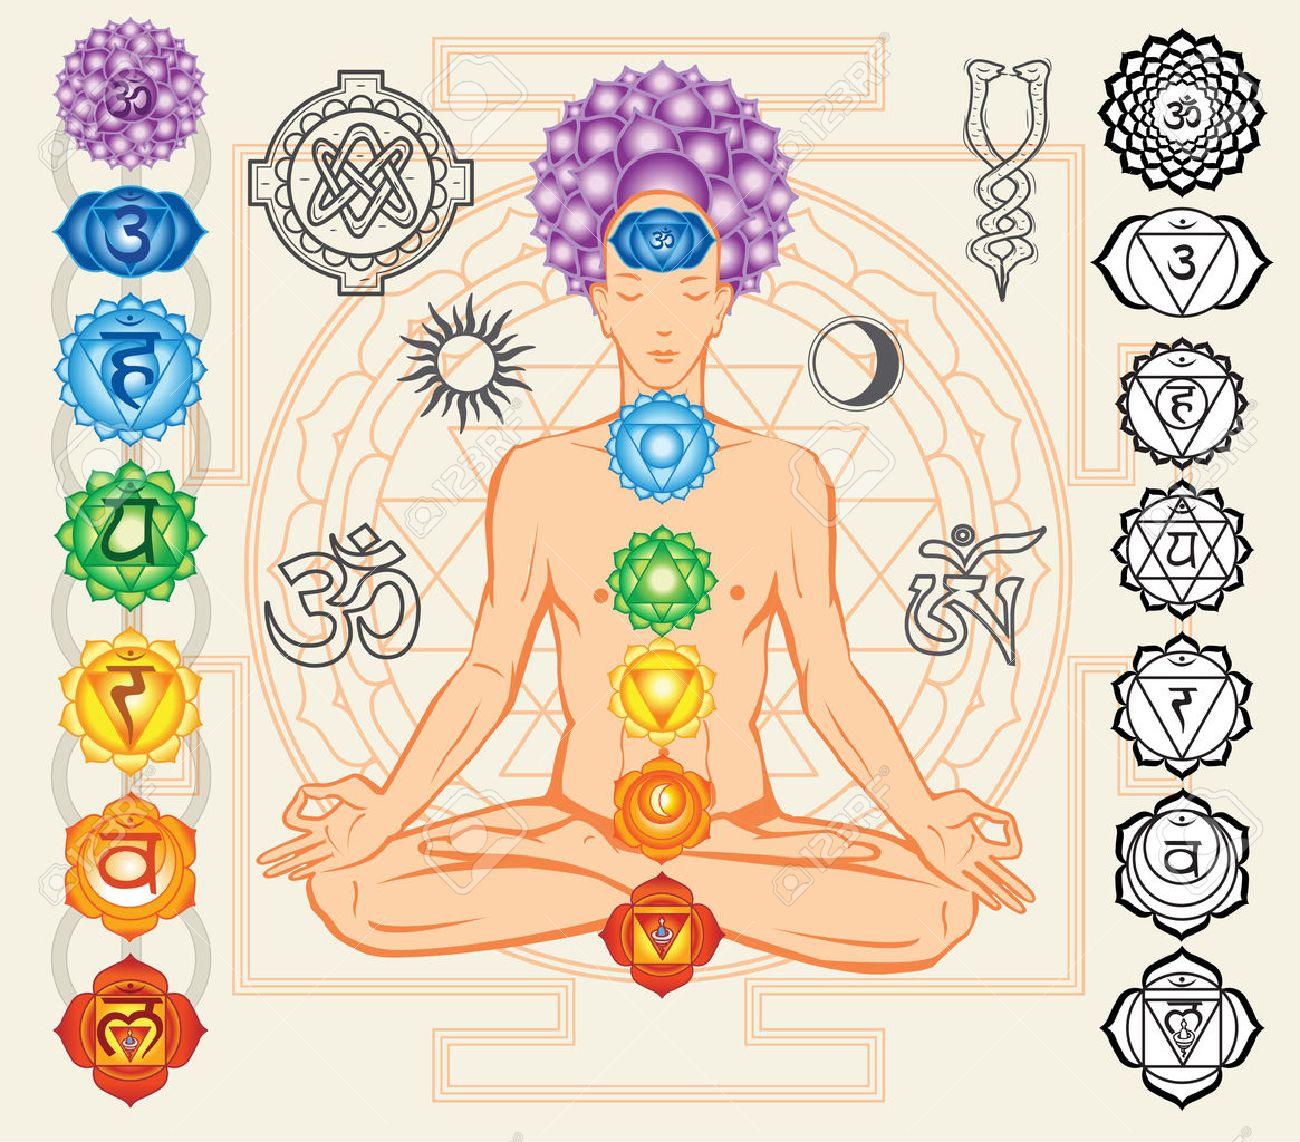 Esoterismo:  El Pentagrammaton o Tetragrammaton 30828019-Silhouette-of-man-with-chakras-and-esoteric-symbols-Stock-Vector